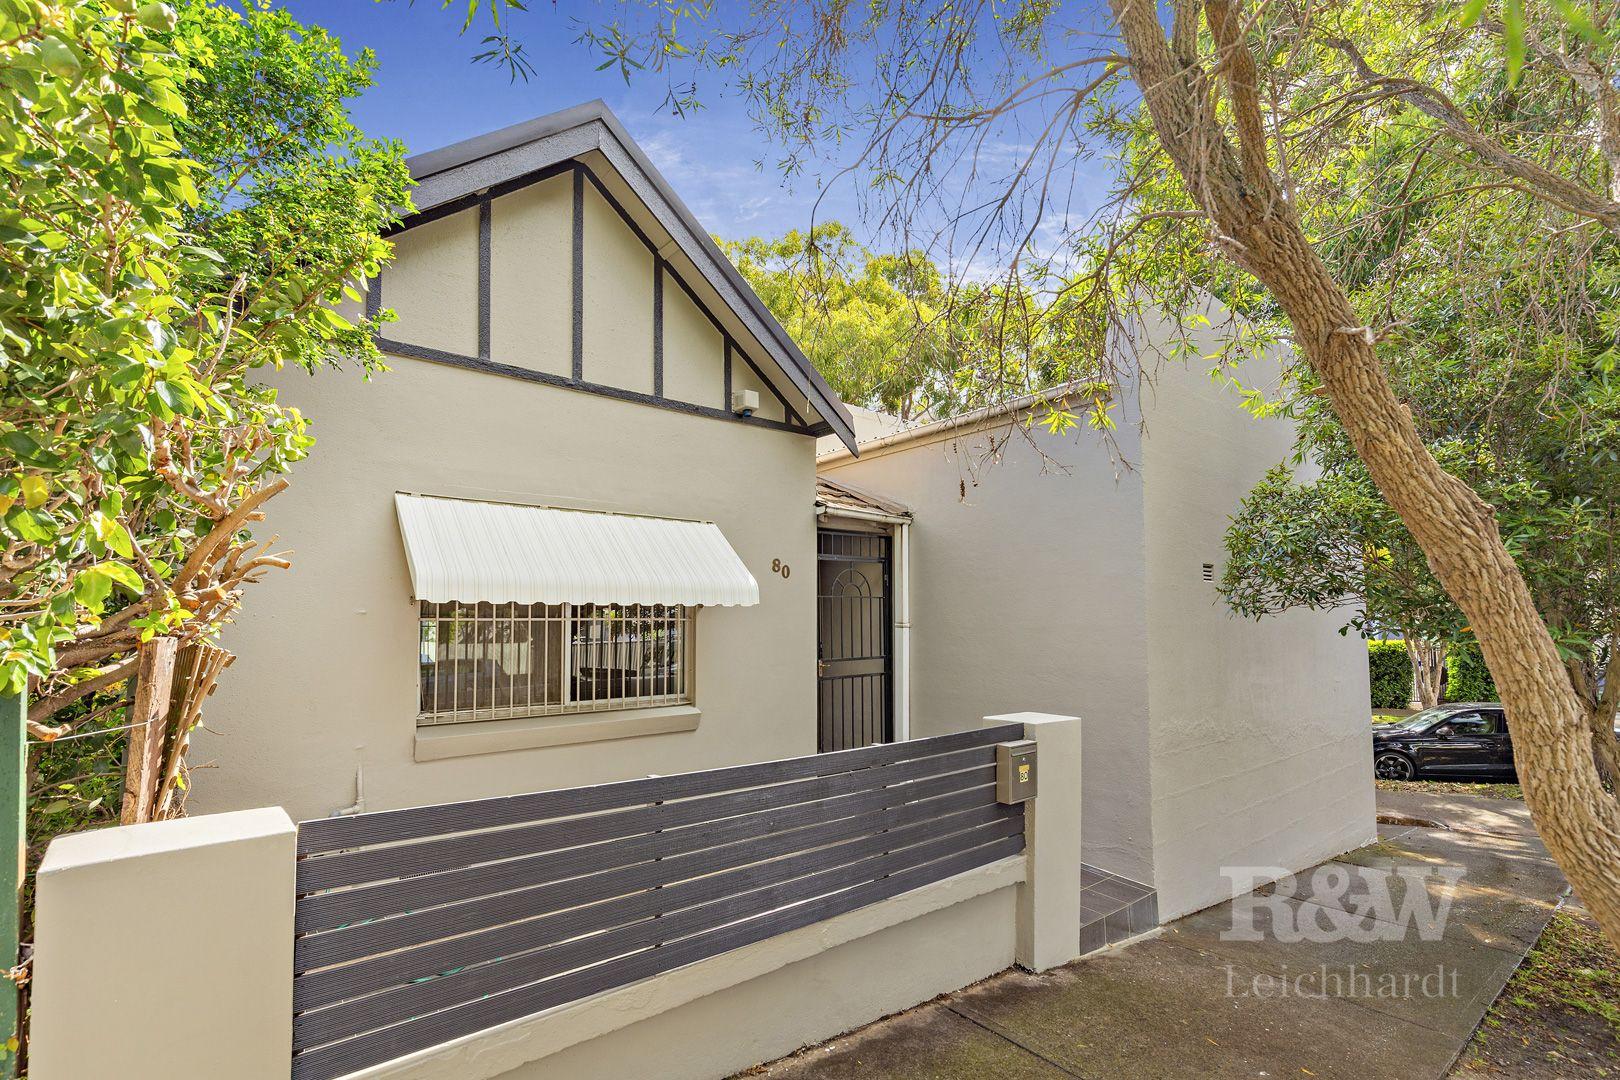 80 George Street, Leichhardt NSW 2040, Image 0